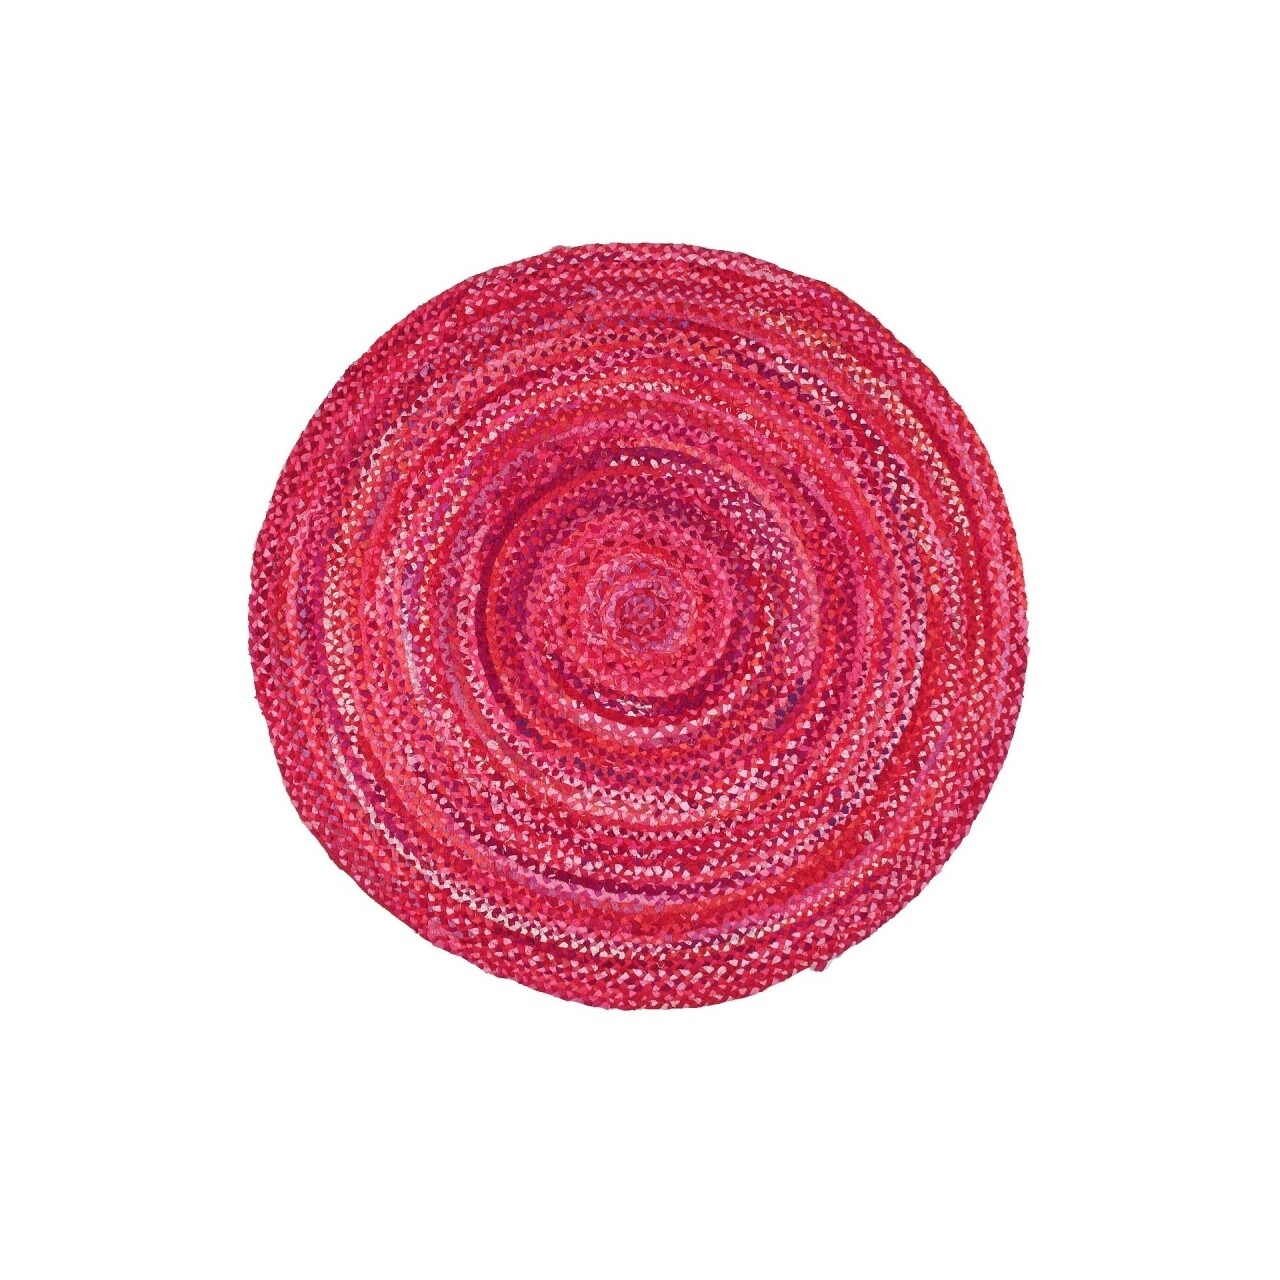 Covor lucrat manual Eko, MX 08 - Pink Q, 100% bumbac,  120 cm Ø